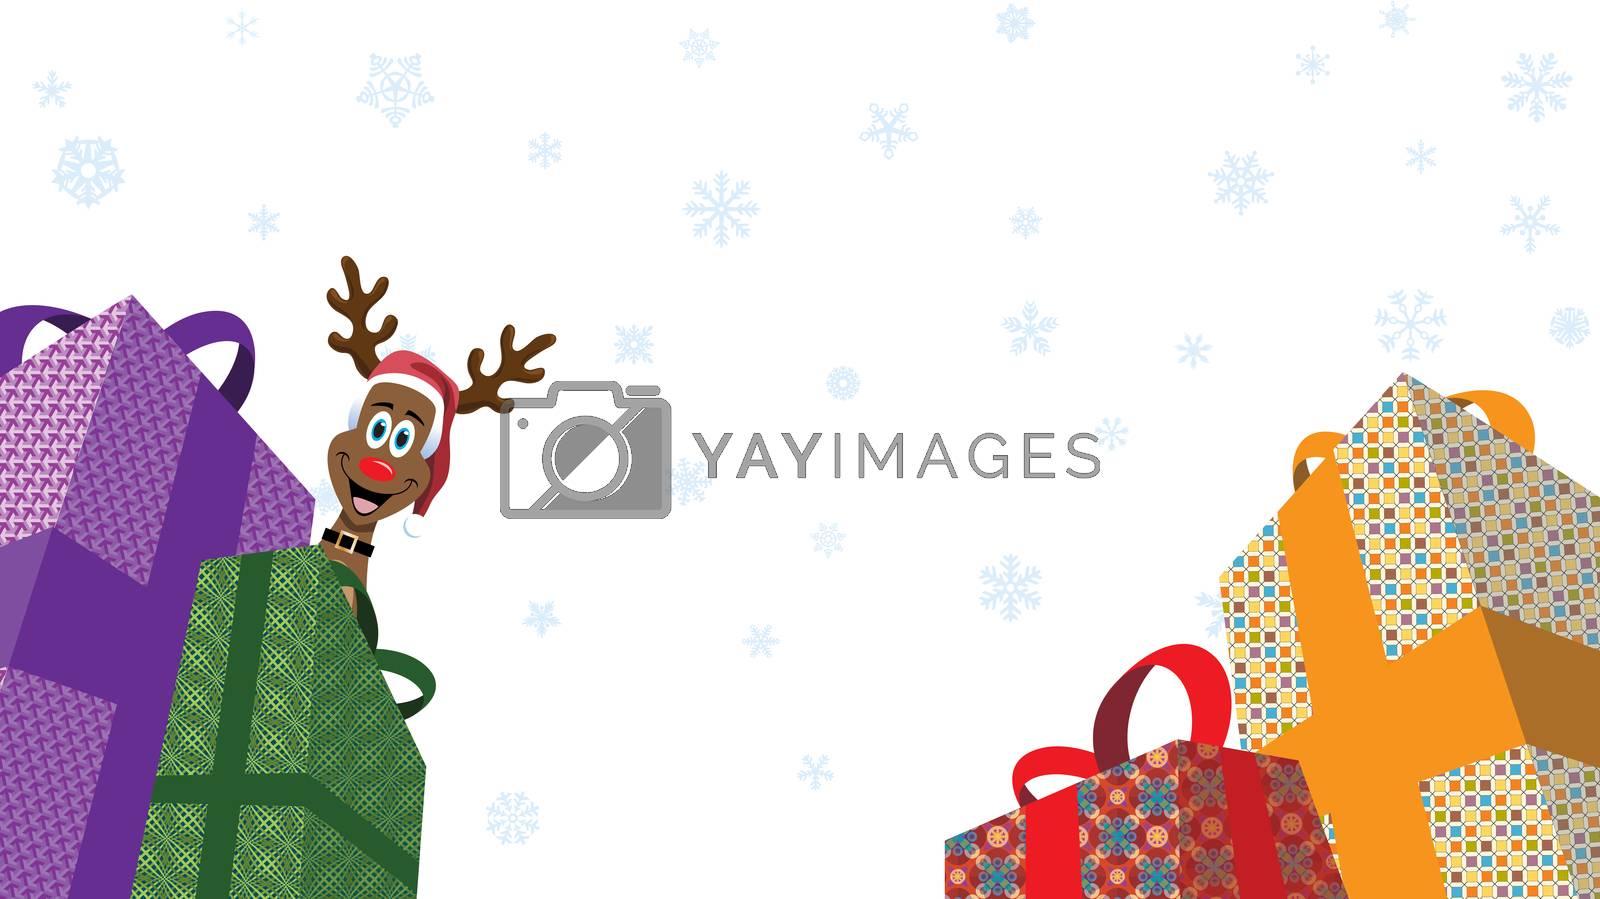 Christmas Presents and reindeer peeking while white snowflakes flakes